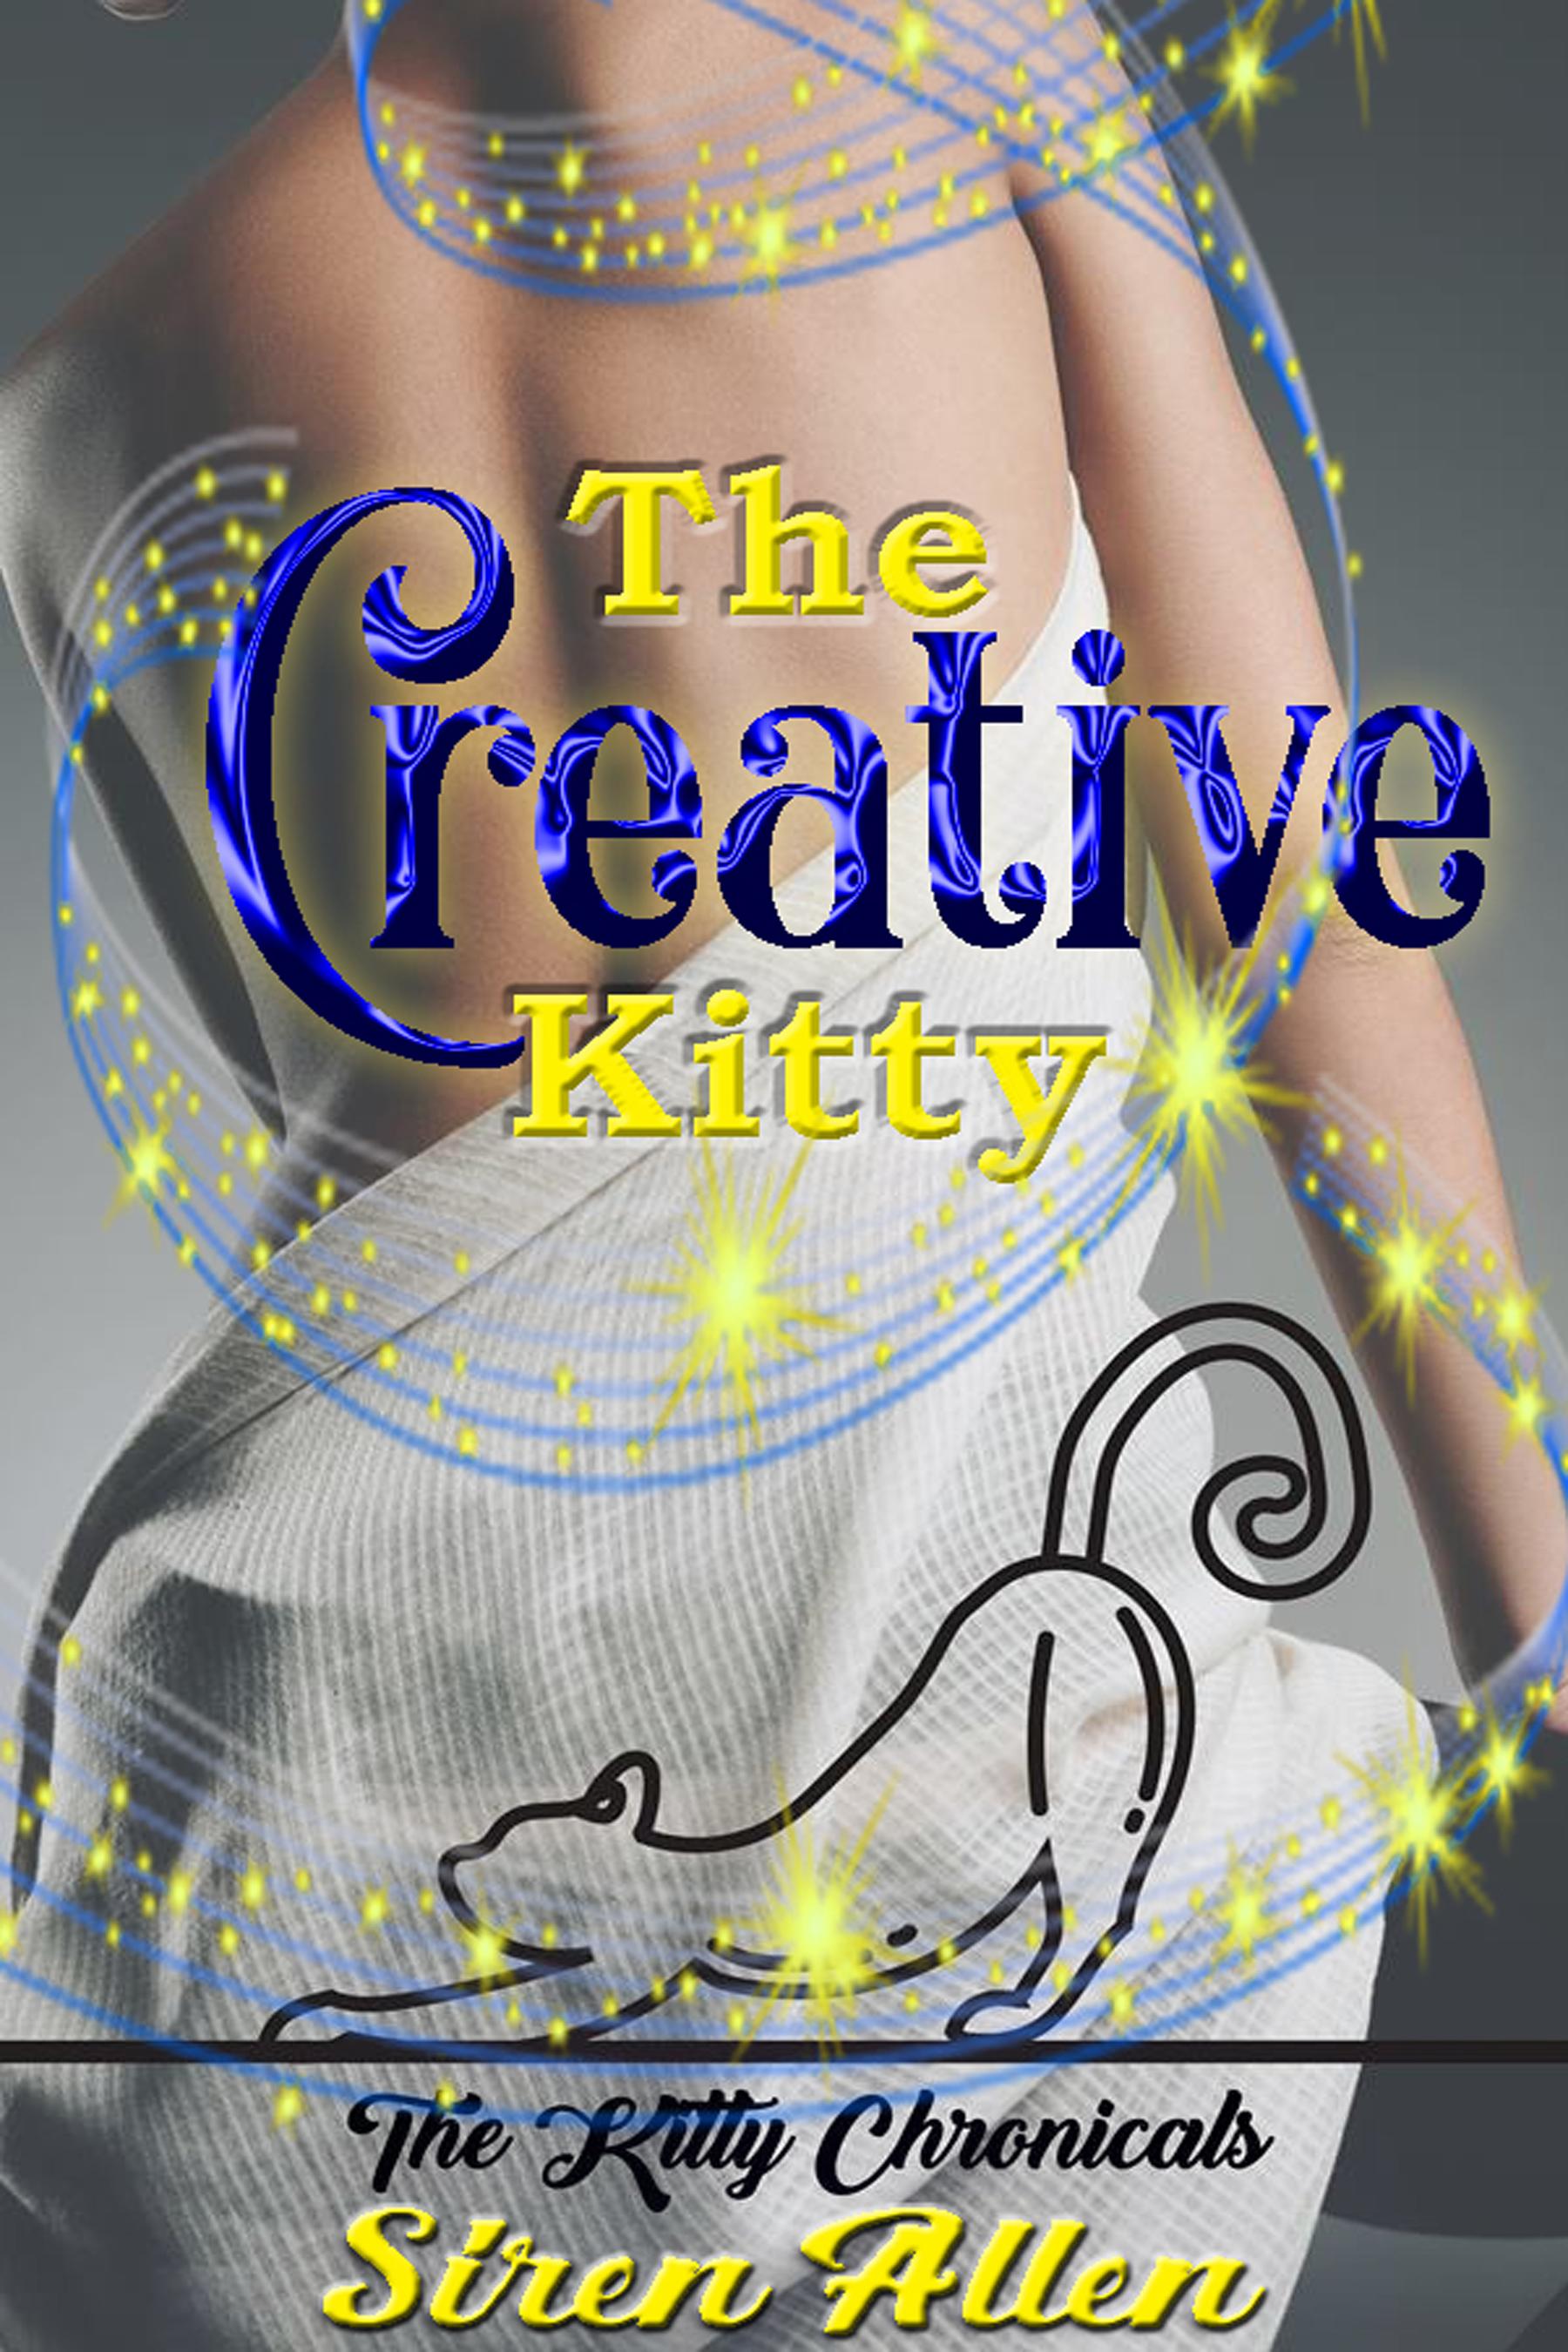 The Creative Kittyfinal